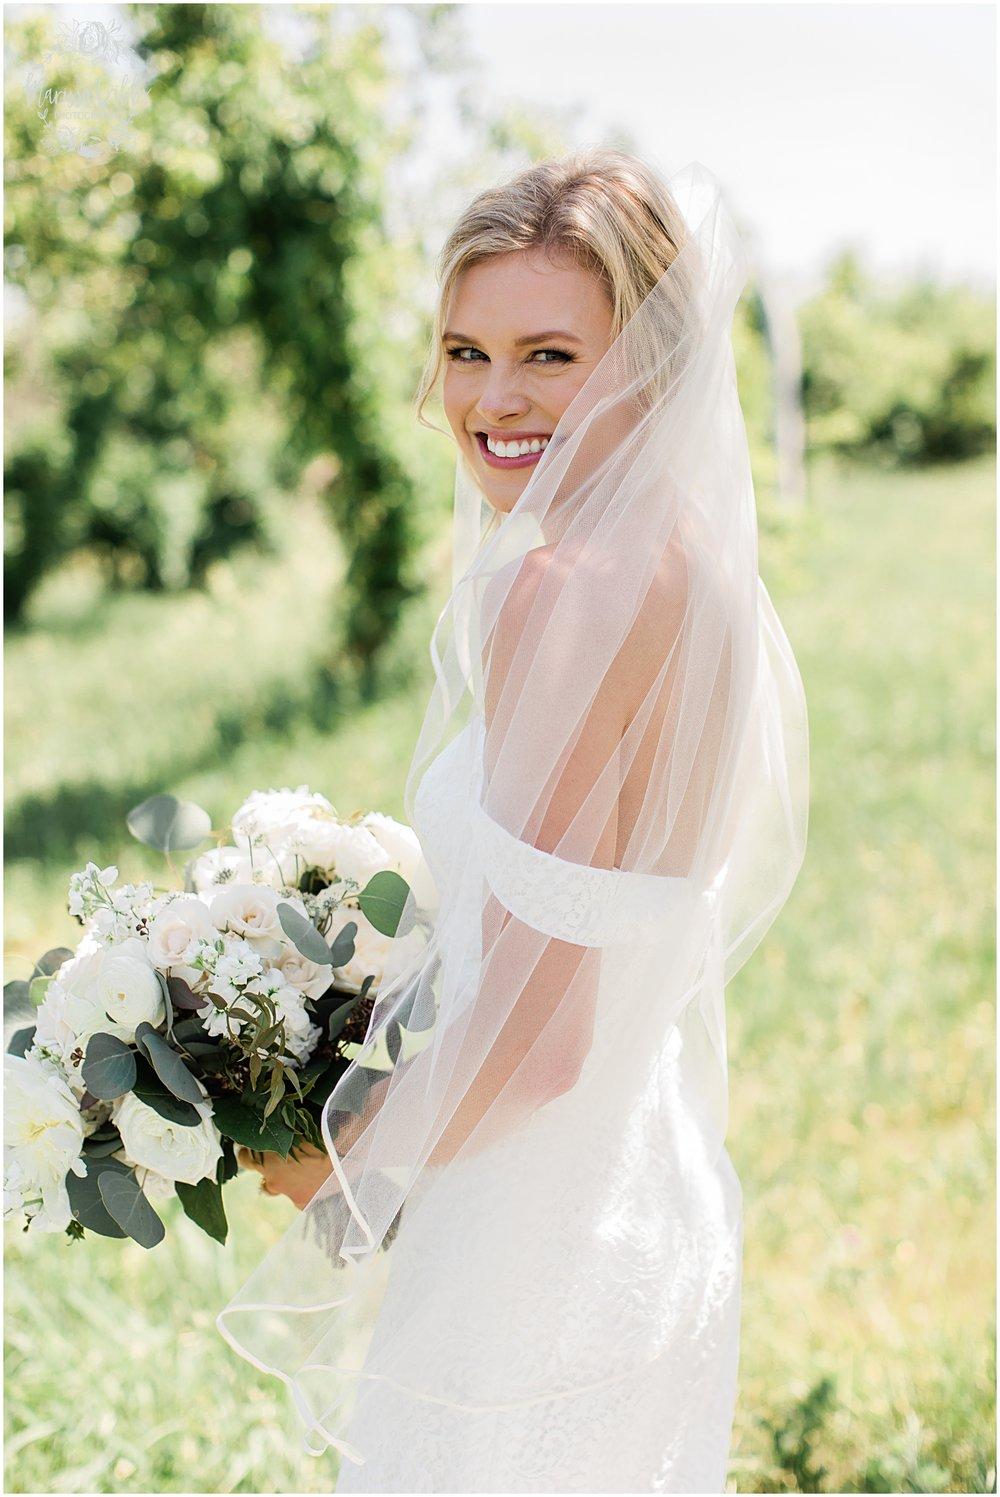 RHODES WEDDING | WESTON RED BARN FARM | MARISSA CRIBBS PHOTOGRAPHY_5240.jpg